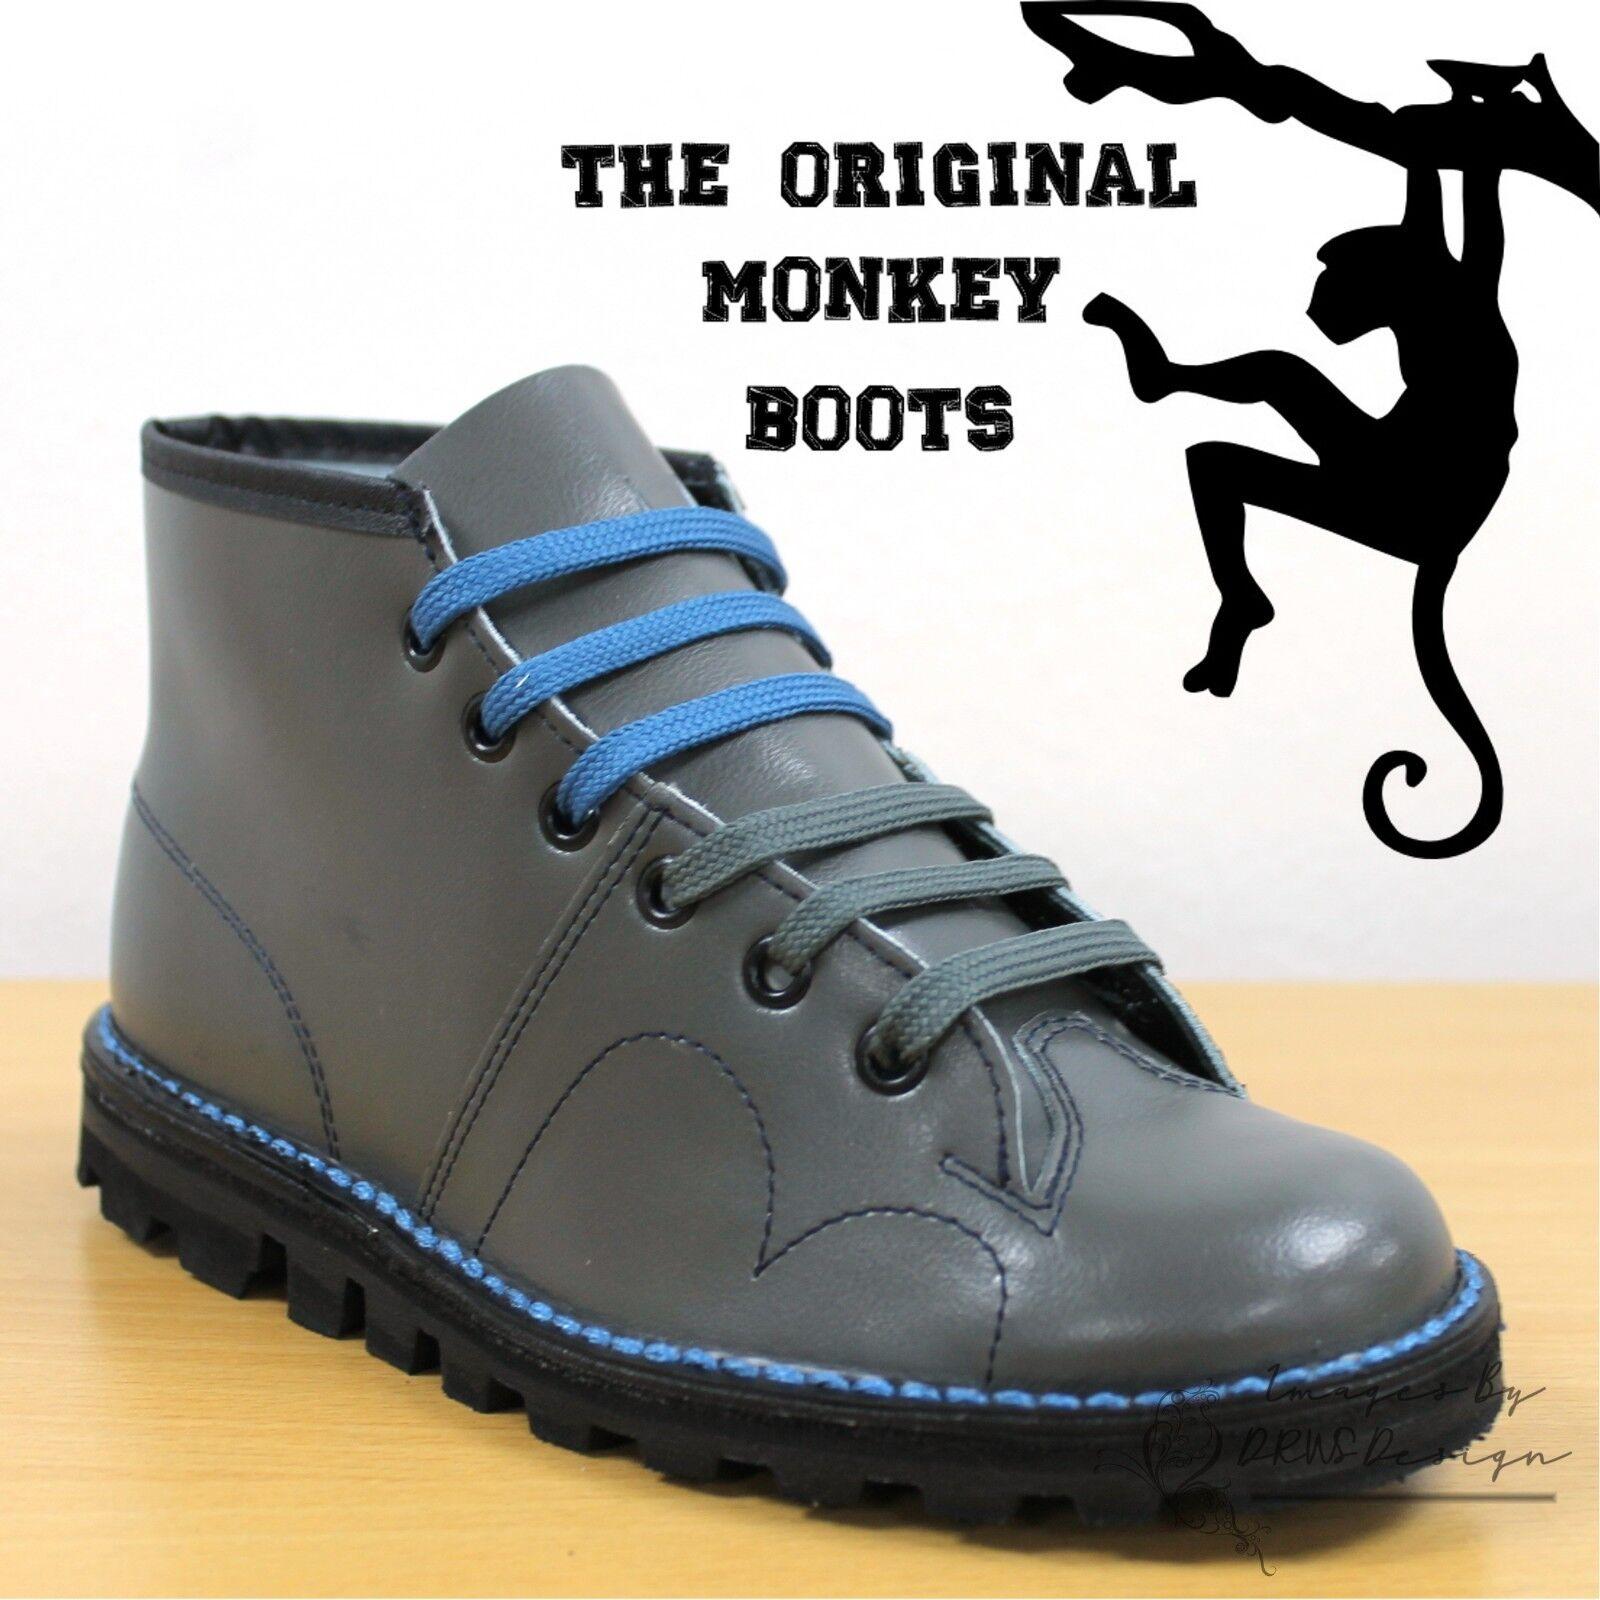 Grafters The Original Original Original Monkey Boots Men's Women's & Kids Retro 60's Grey shoes 67bbdd